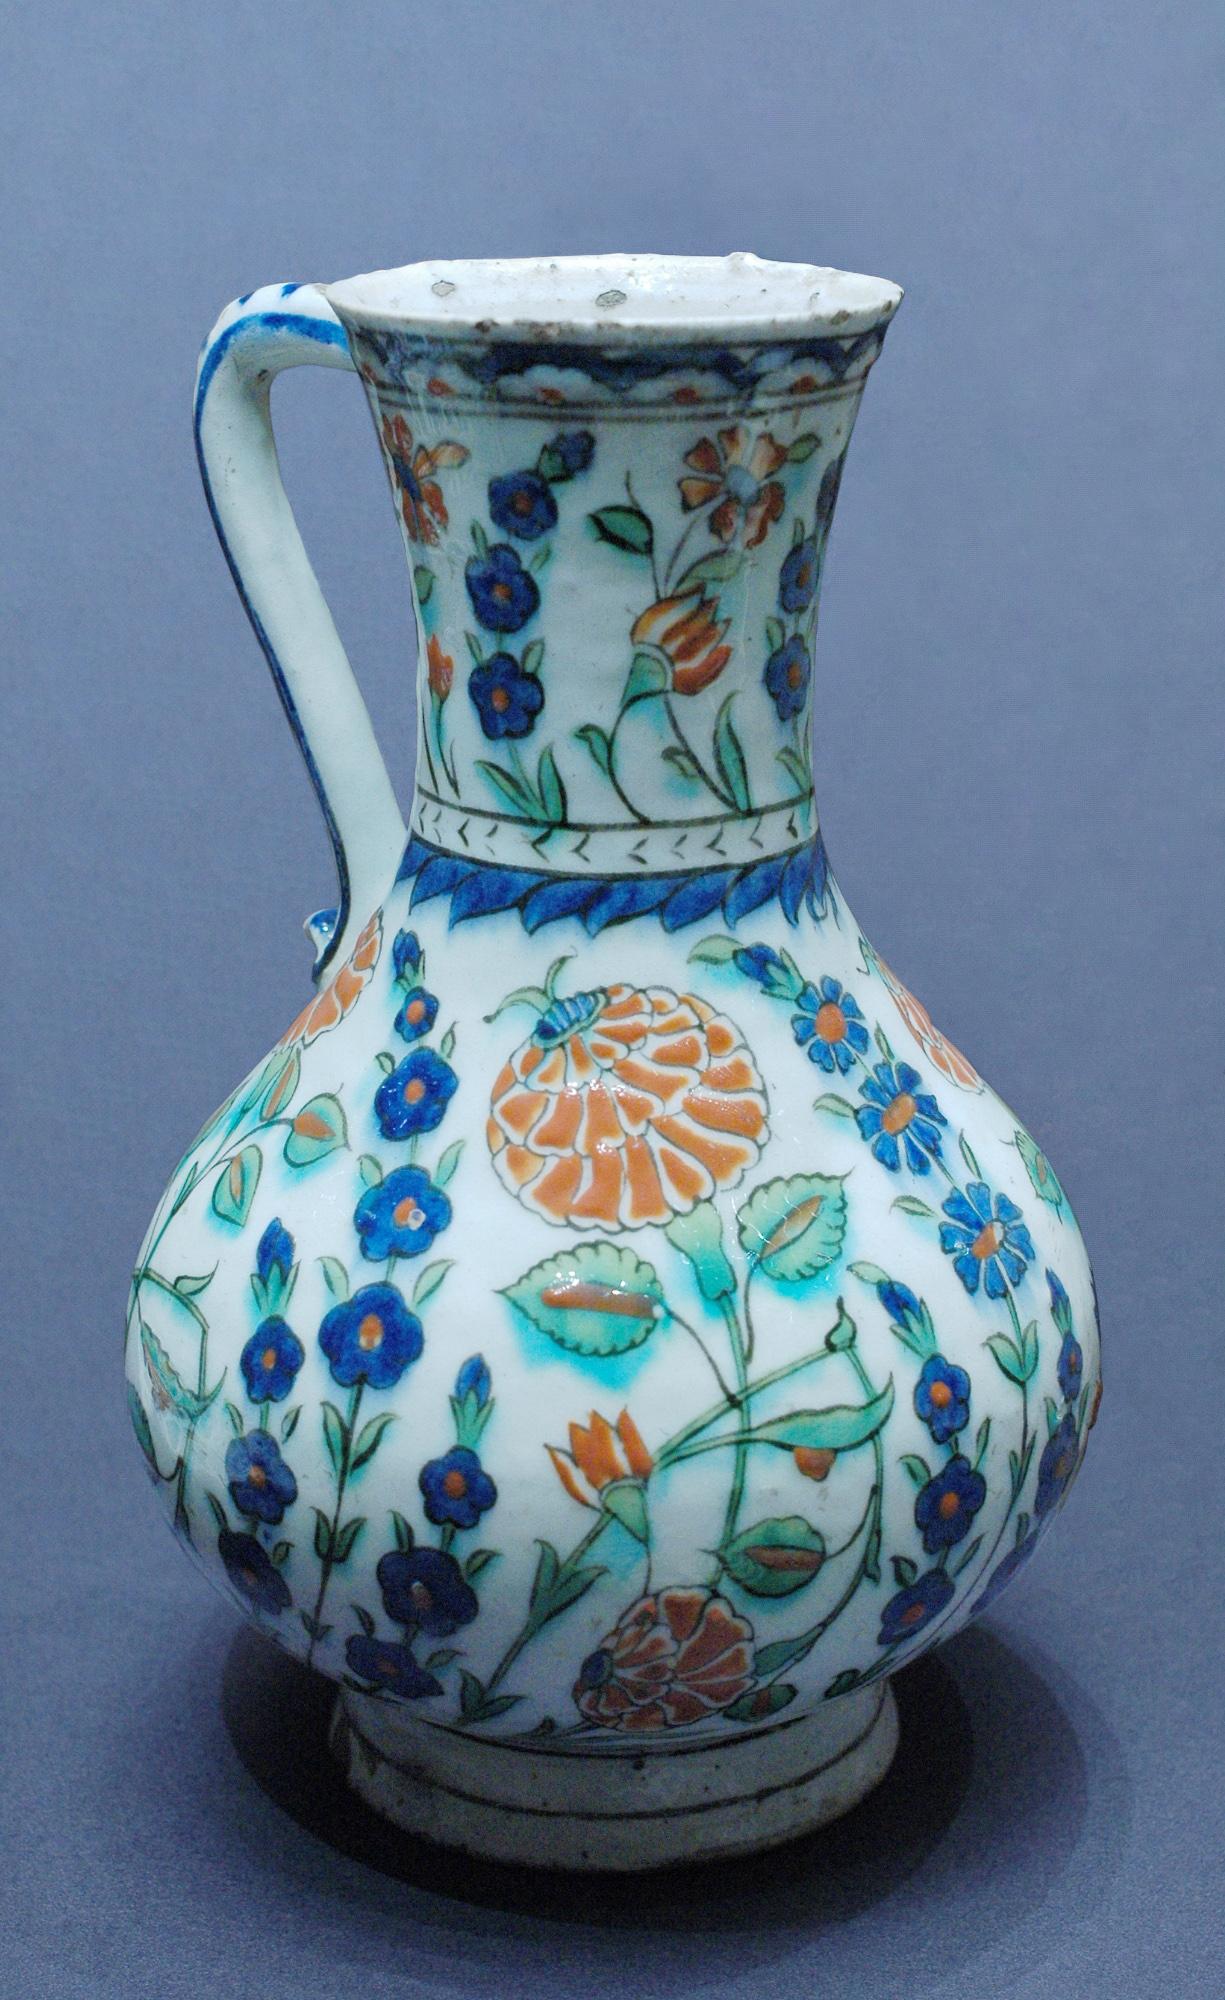 Céramique d'Iznik